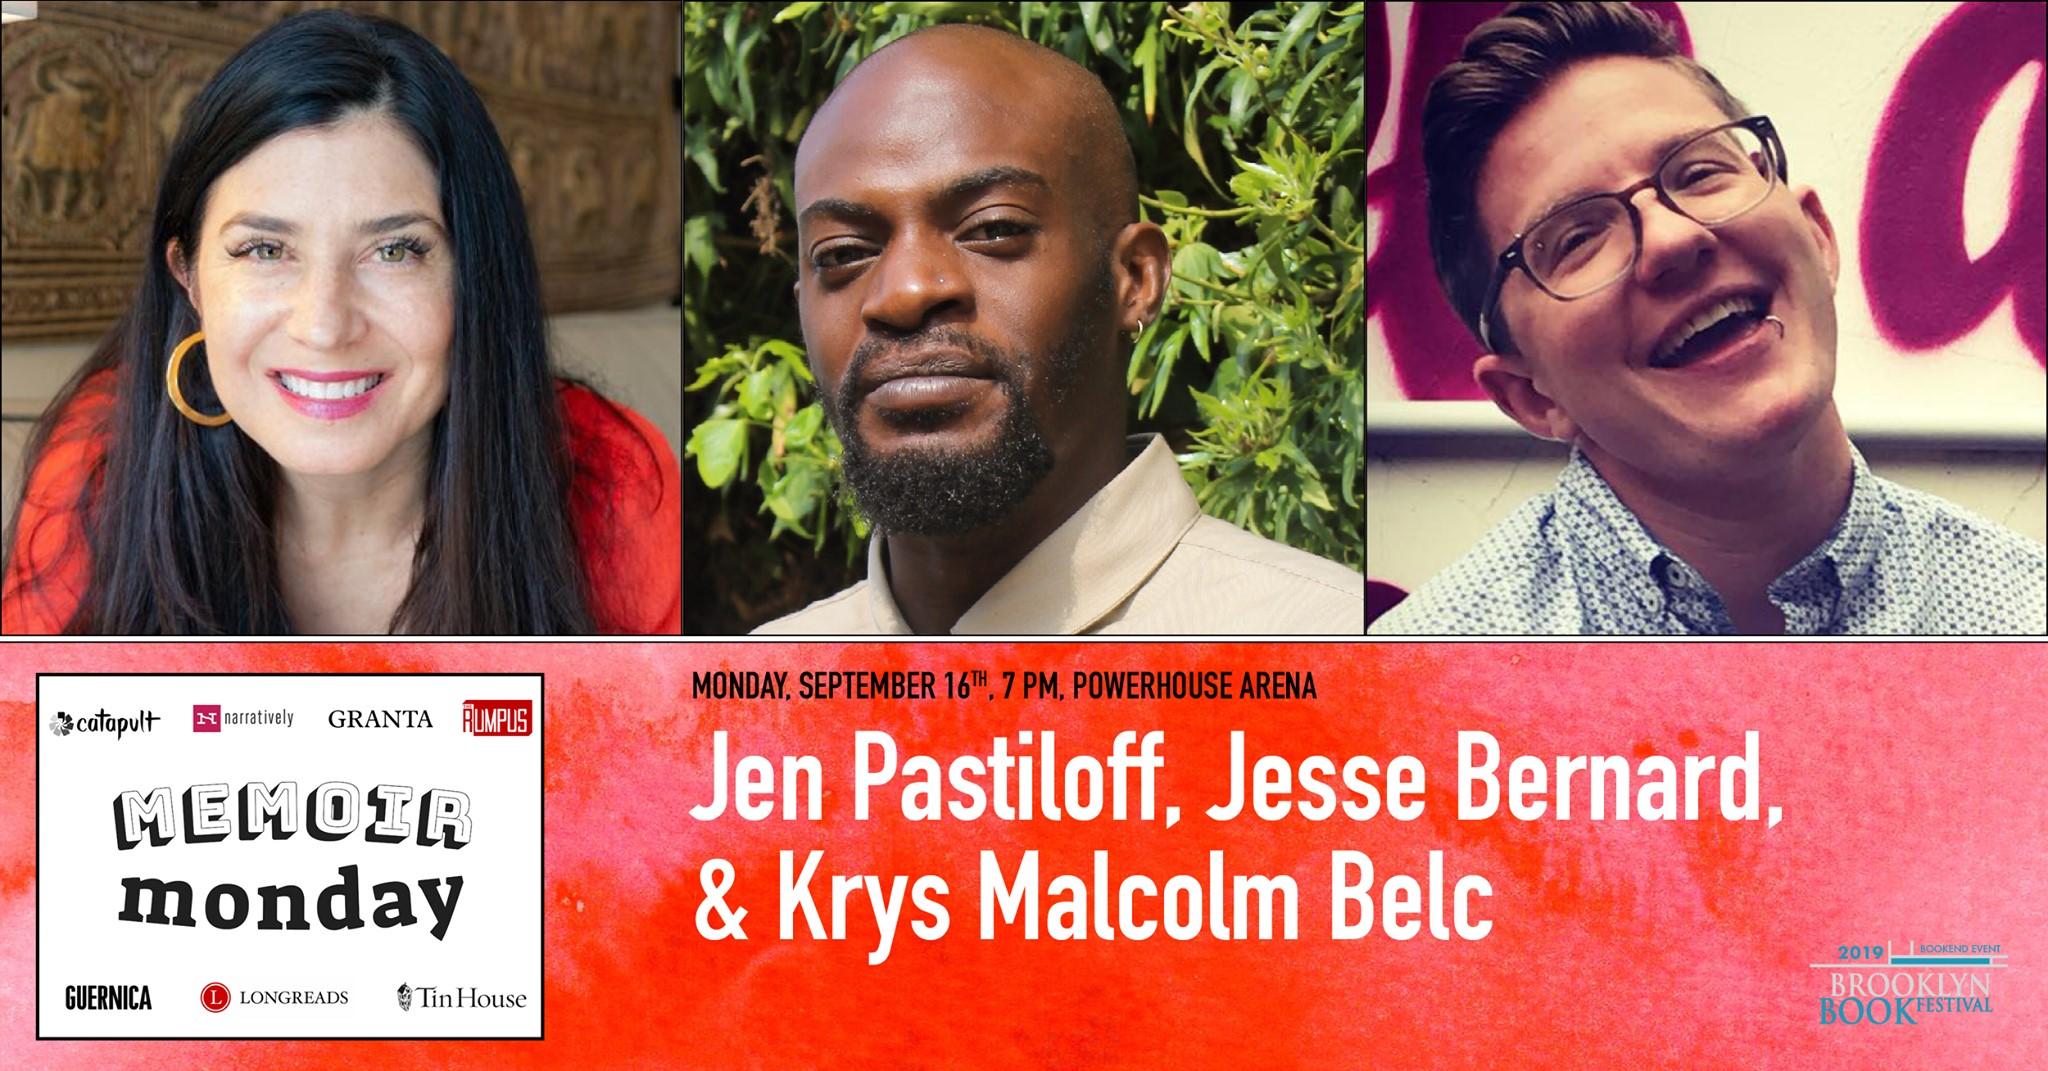 Memoir Monday: Featuring Jennifer Pastiloff, Jesse Bernard & Krys Malcolm Belc (Brooklyn Book Festival Bookends Event)